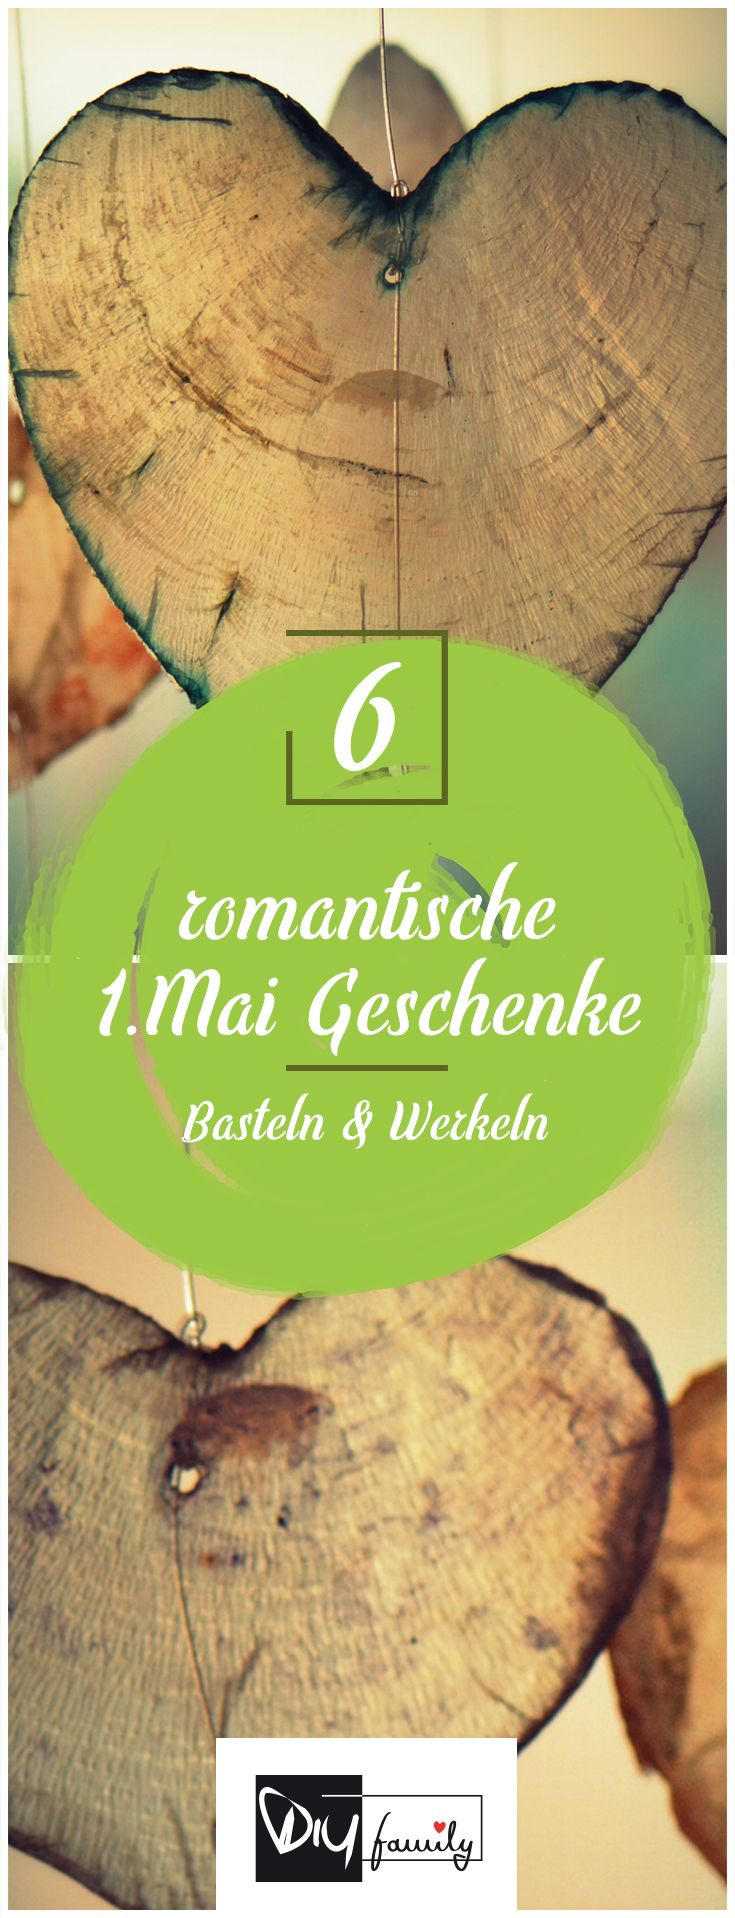 Der 1. Mai – 6 romantische Ideen rund ums Geschenk  #1.mai, #diy, #selfmade, #handmade, #present, #suprise, #romantic